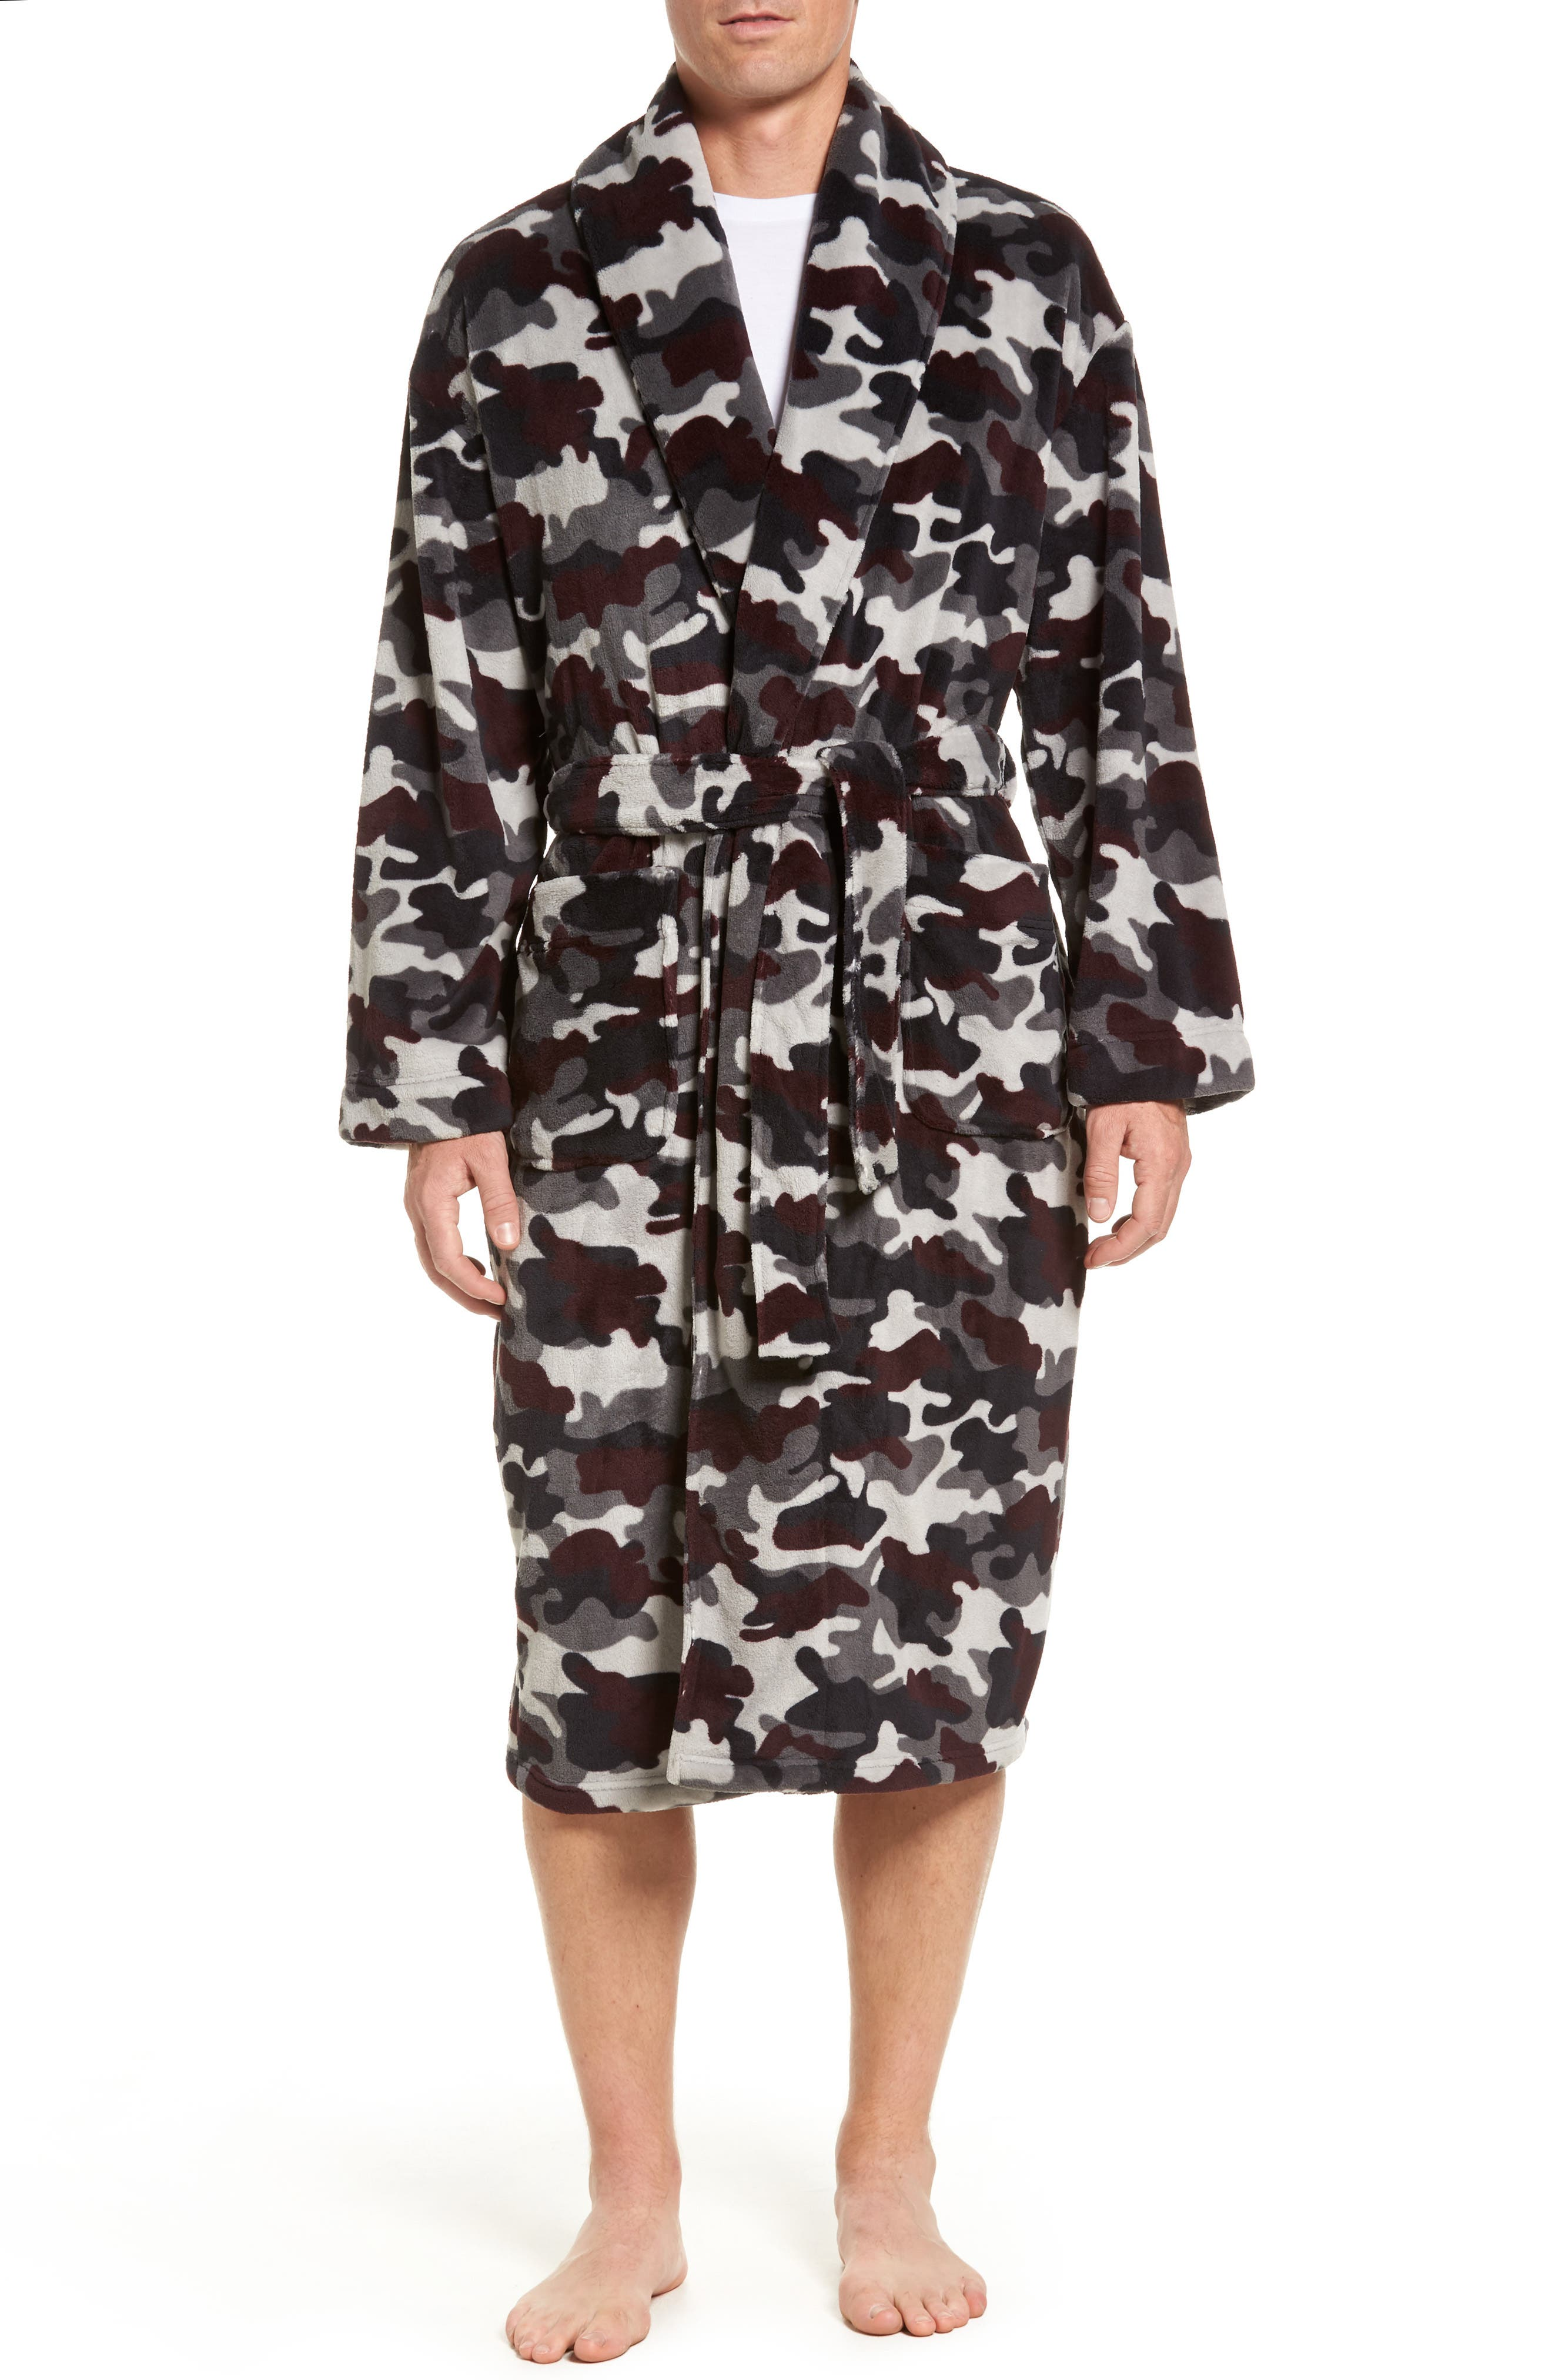 Cold Conquest Robe,                         Main,                         color, Charcoal Camo